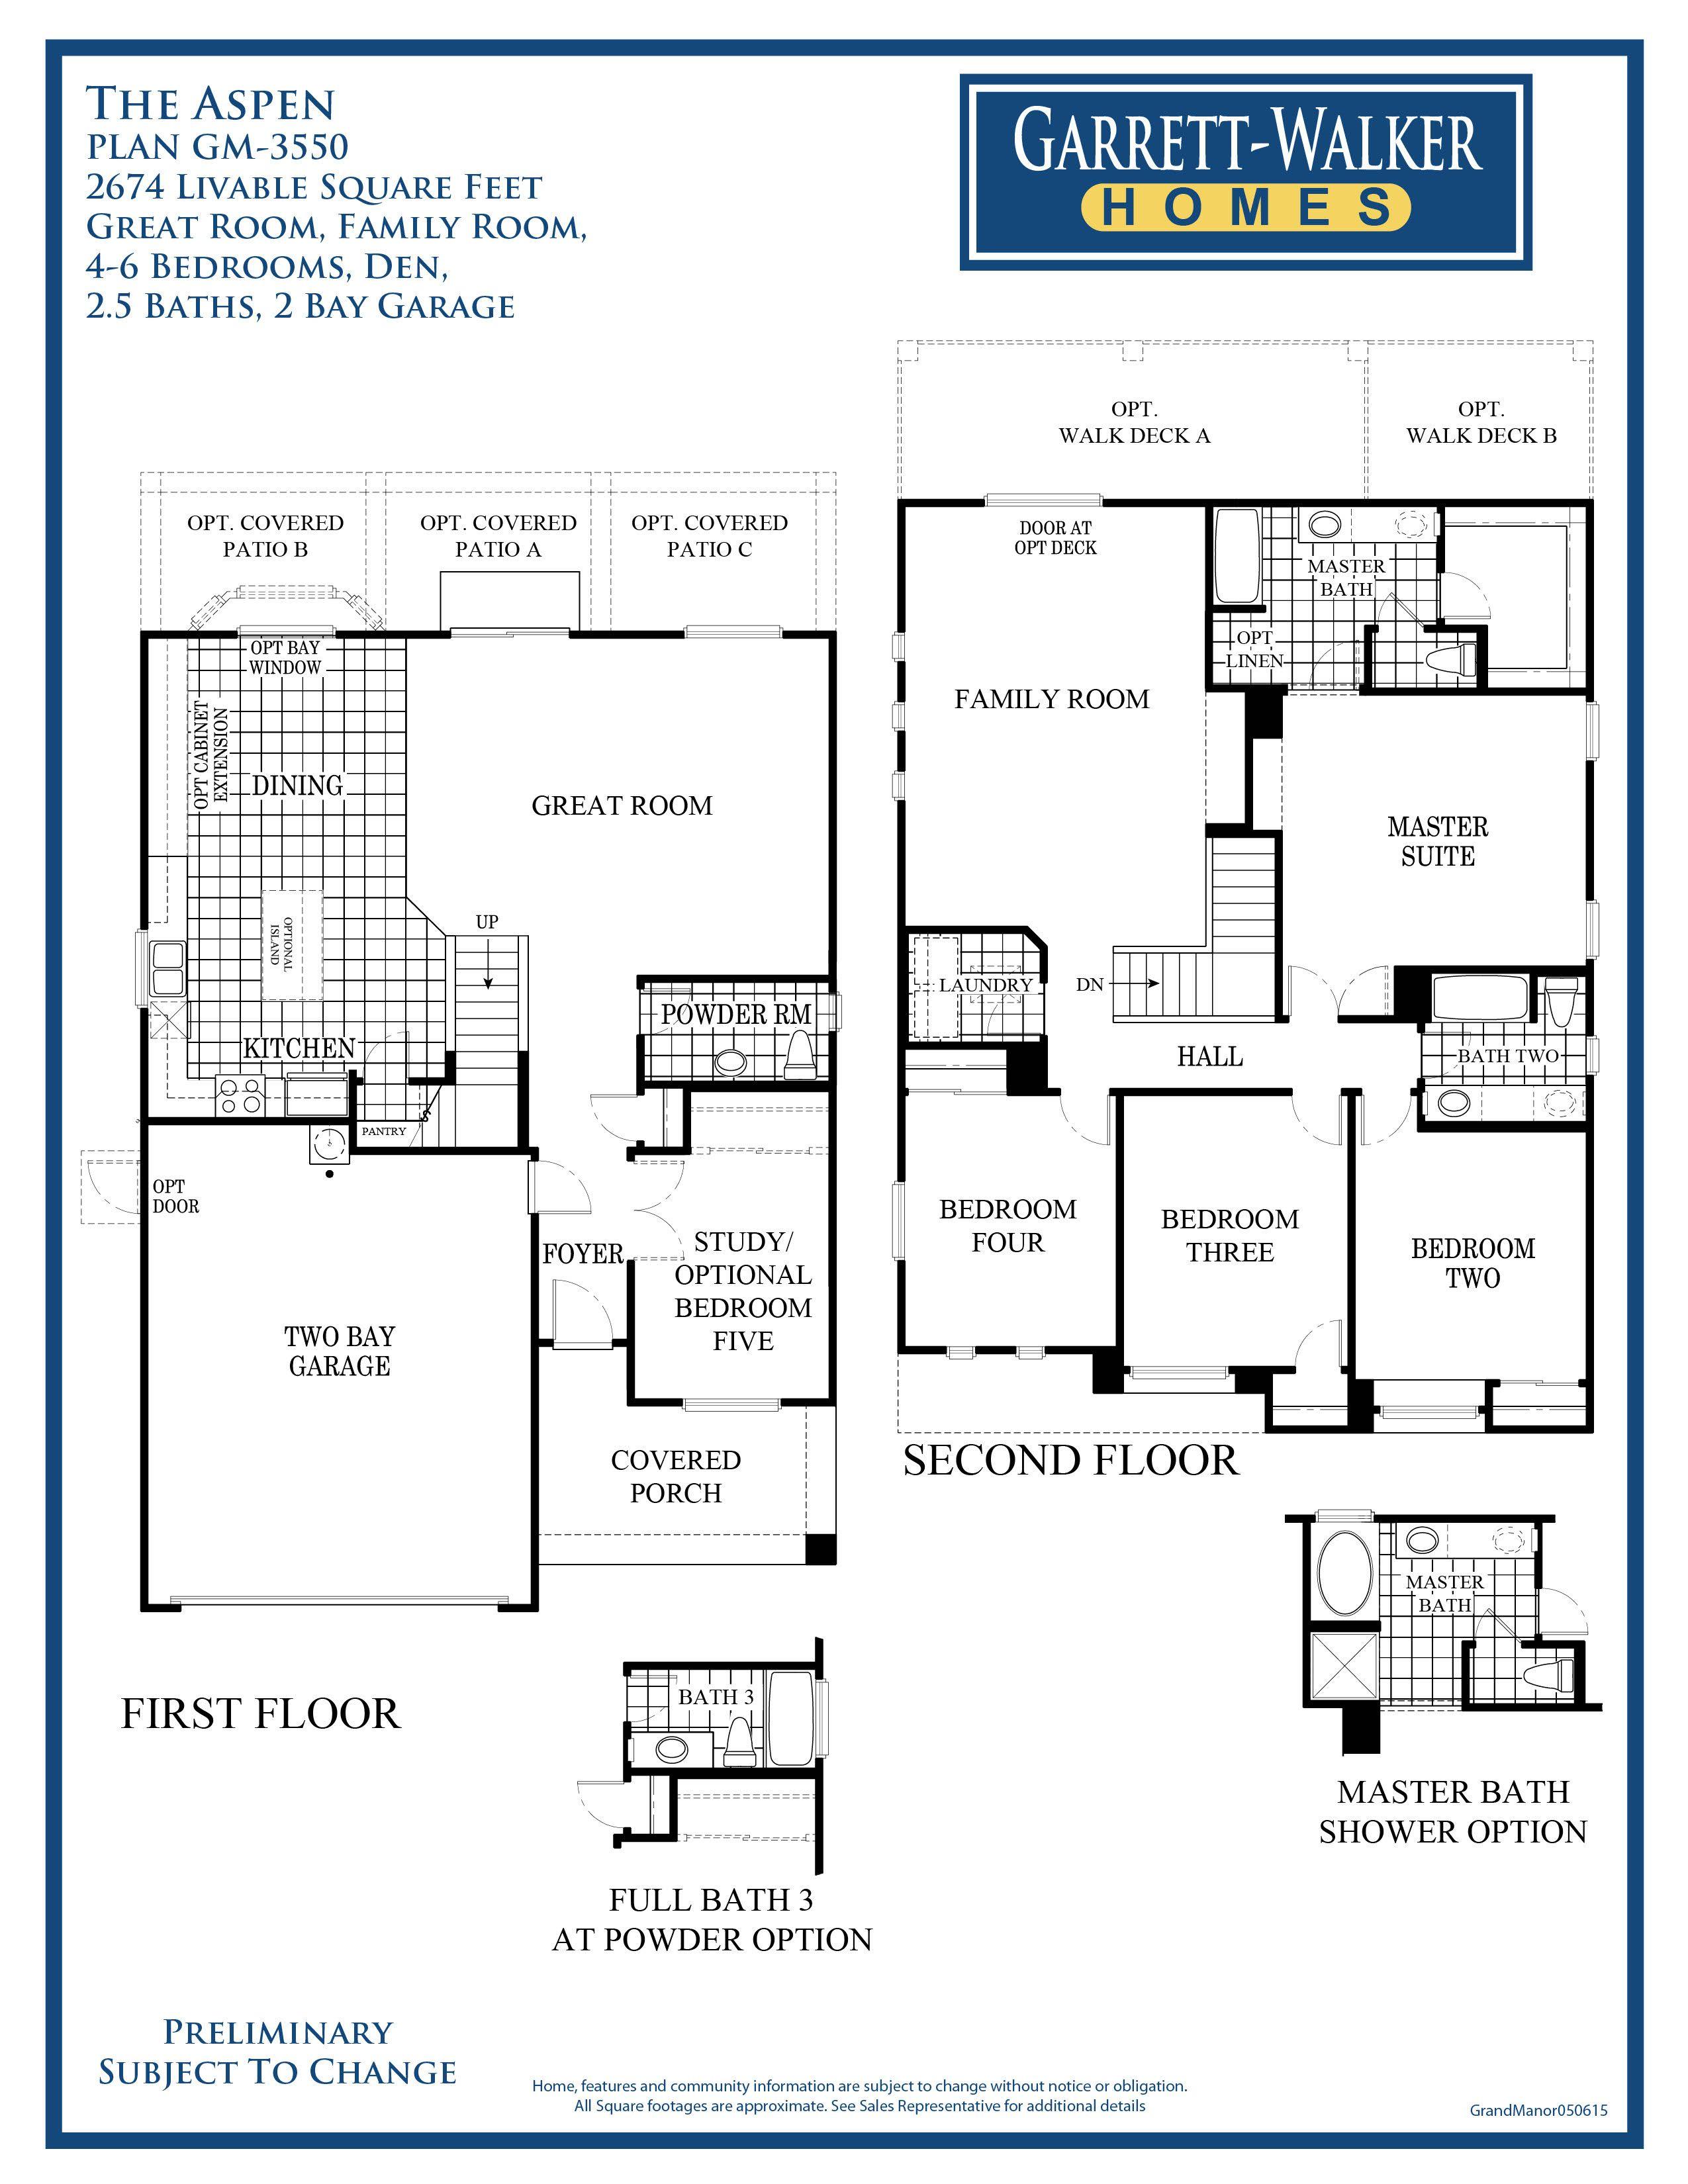 garrett walker homes grand manor community this floor plan shows